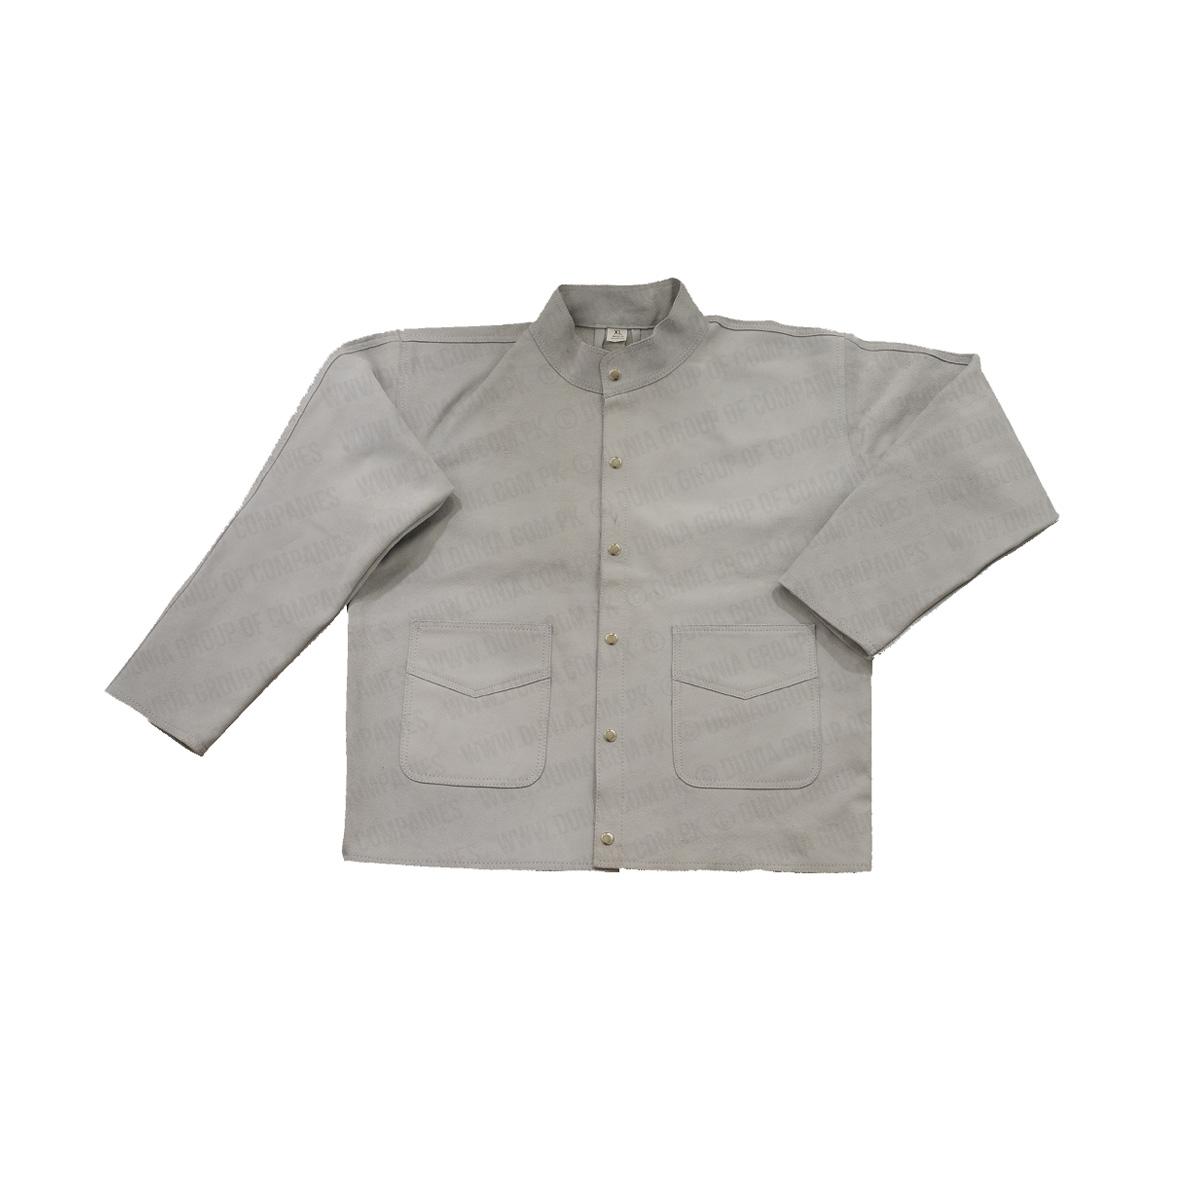 DTC-971 Welding Jacket